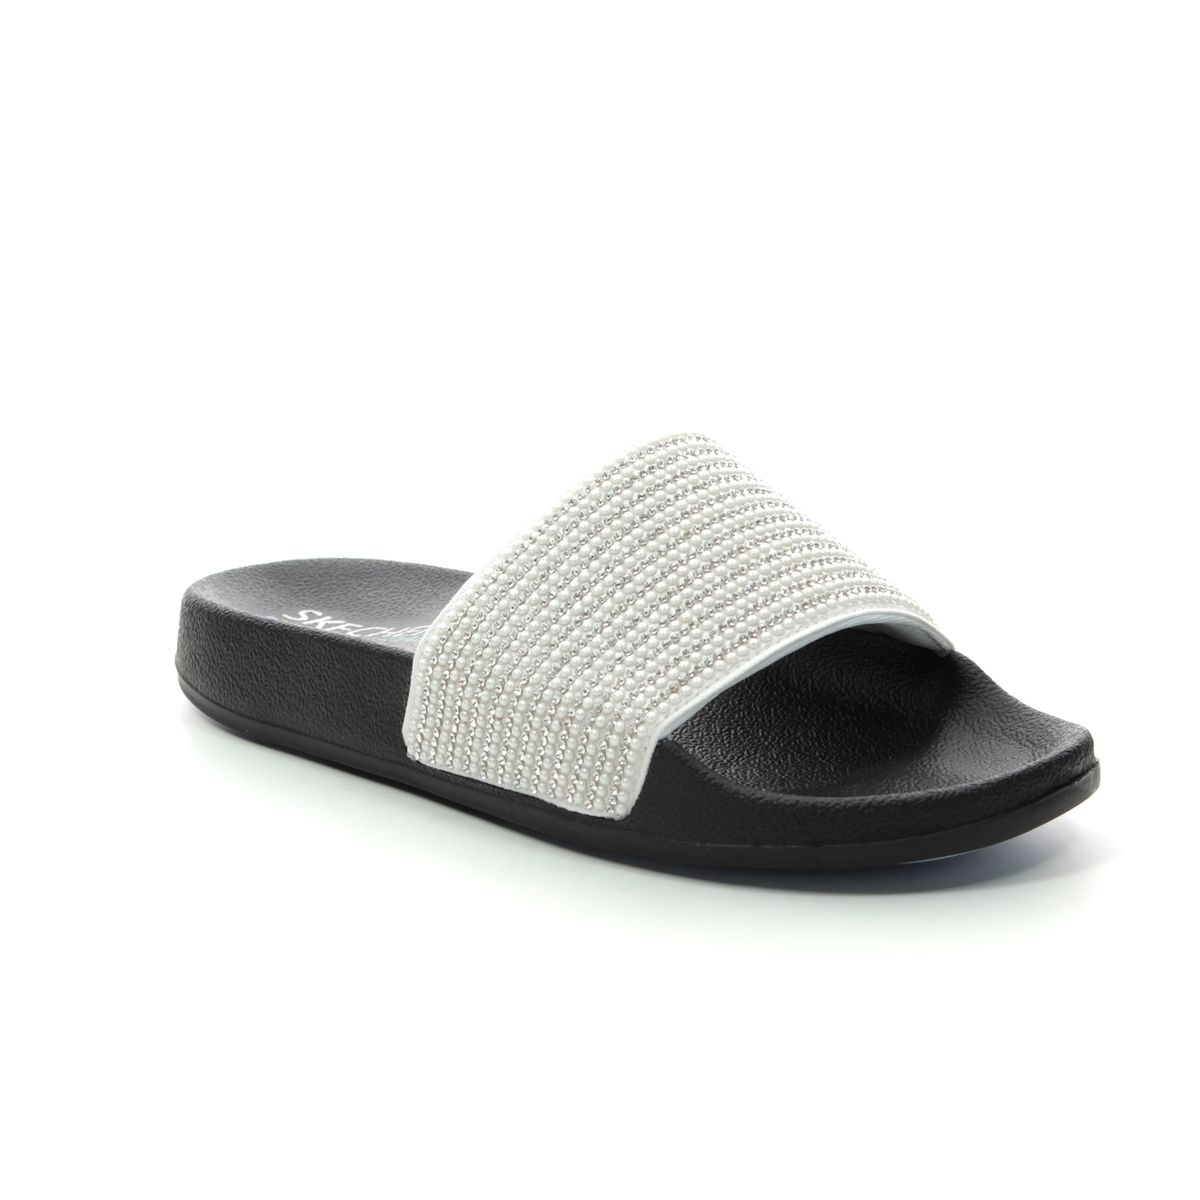 skechers silver sandals